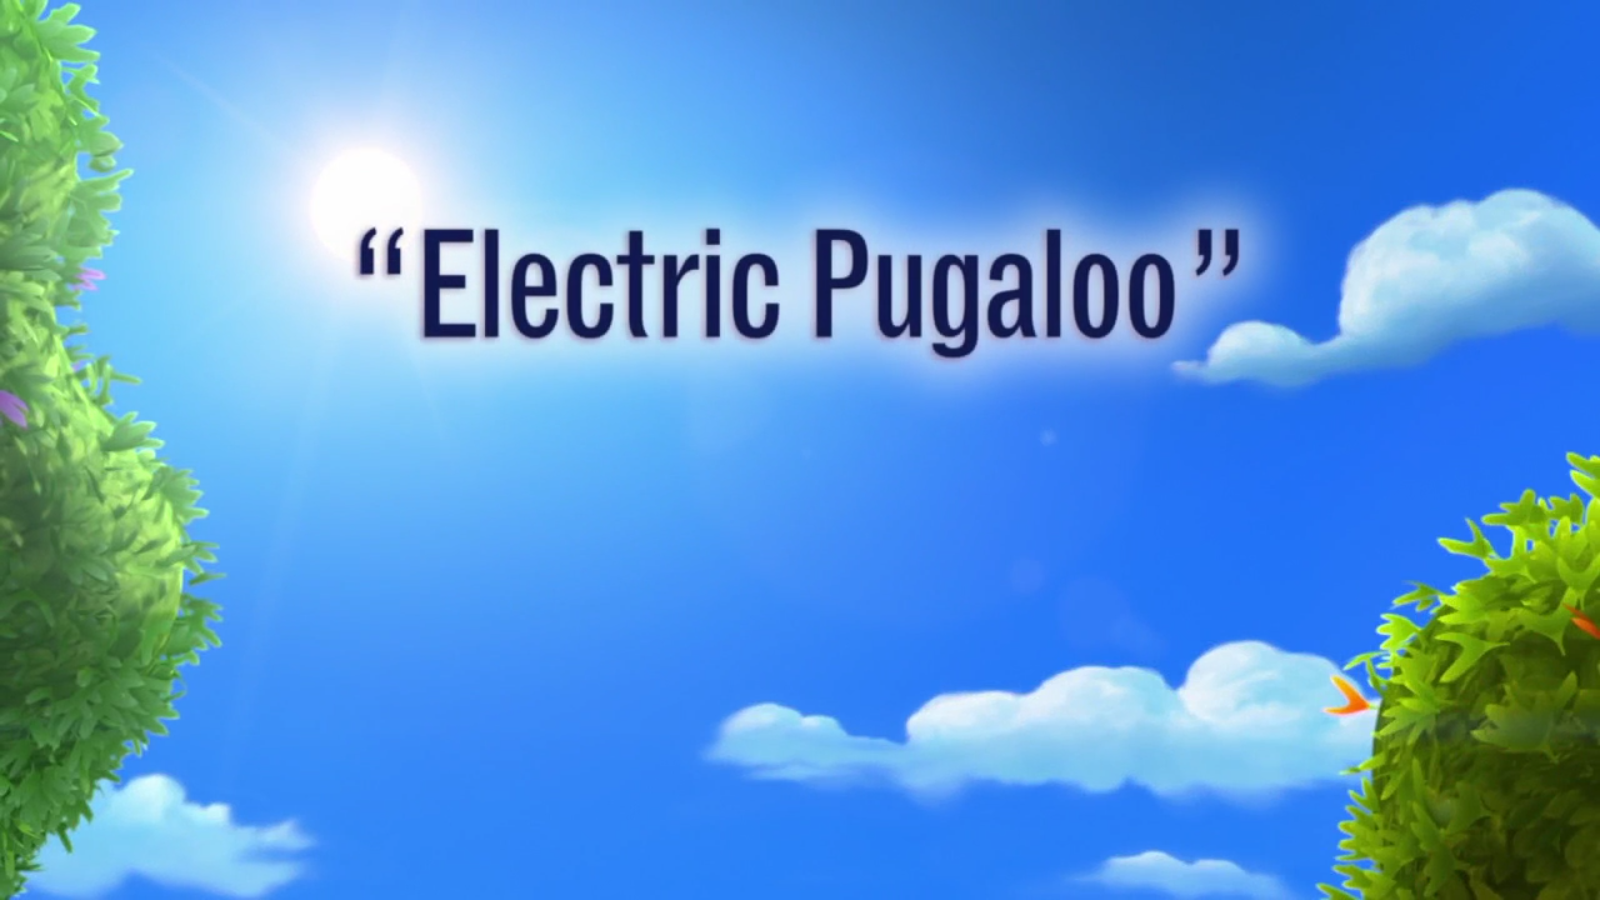 Electric Pugaloo